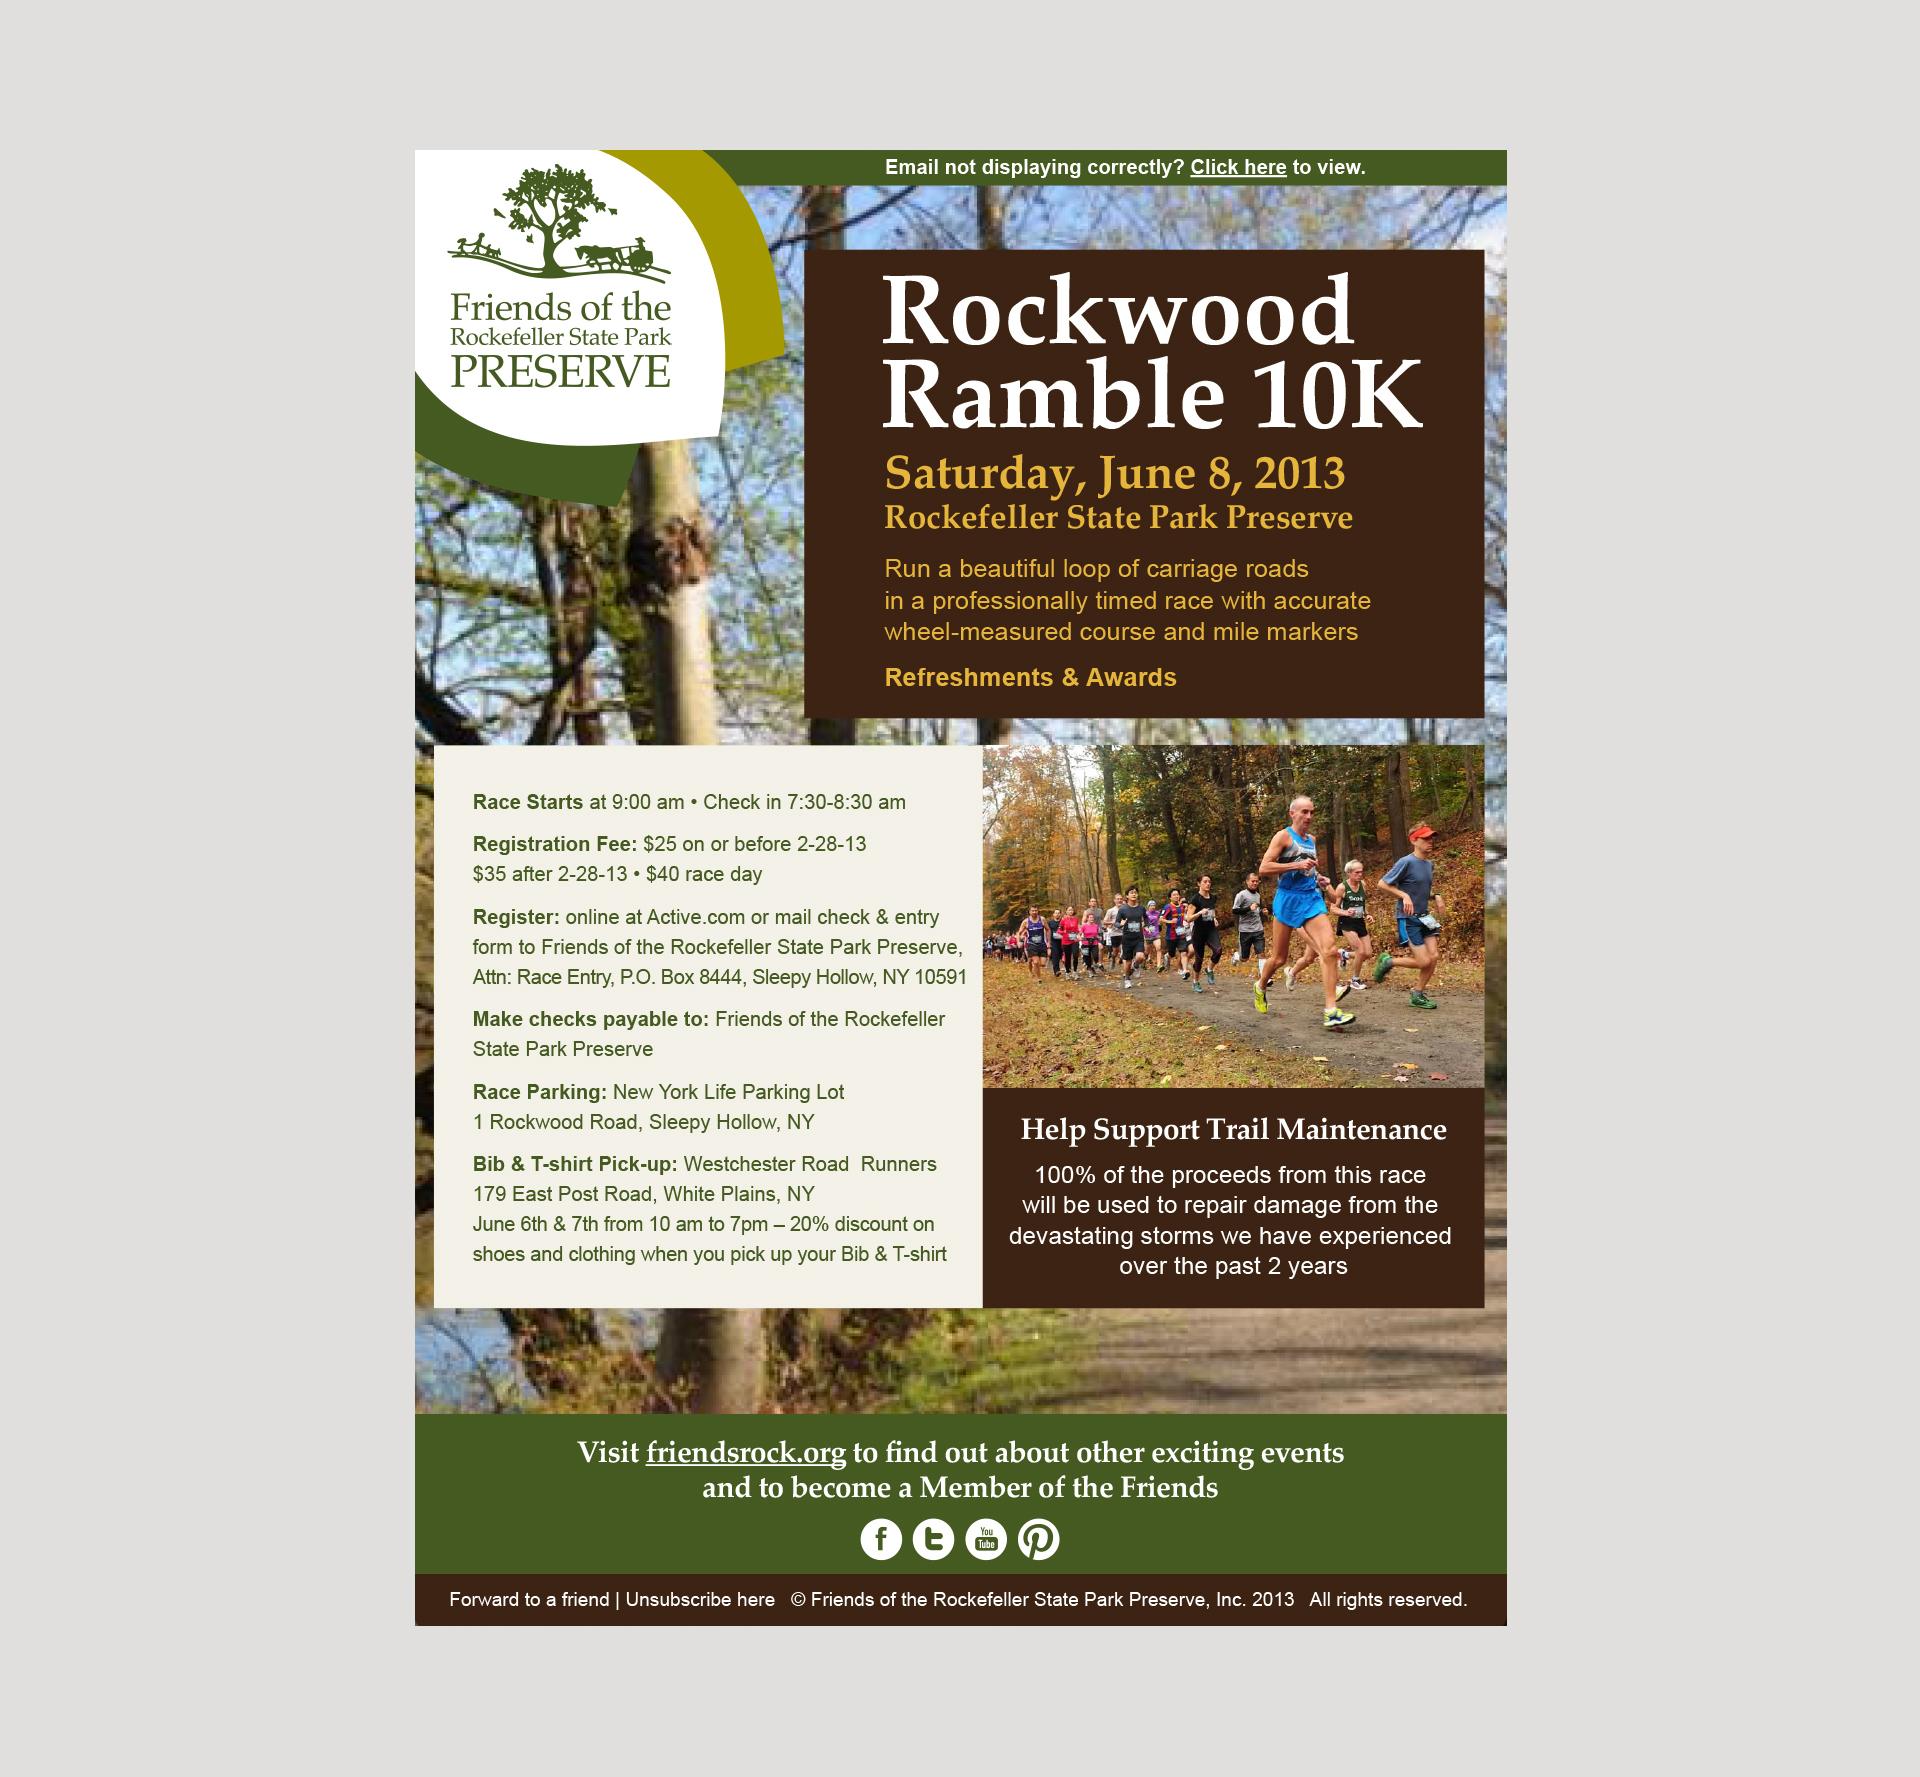 Friends of the Rockefeller State Park Preserve